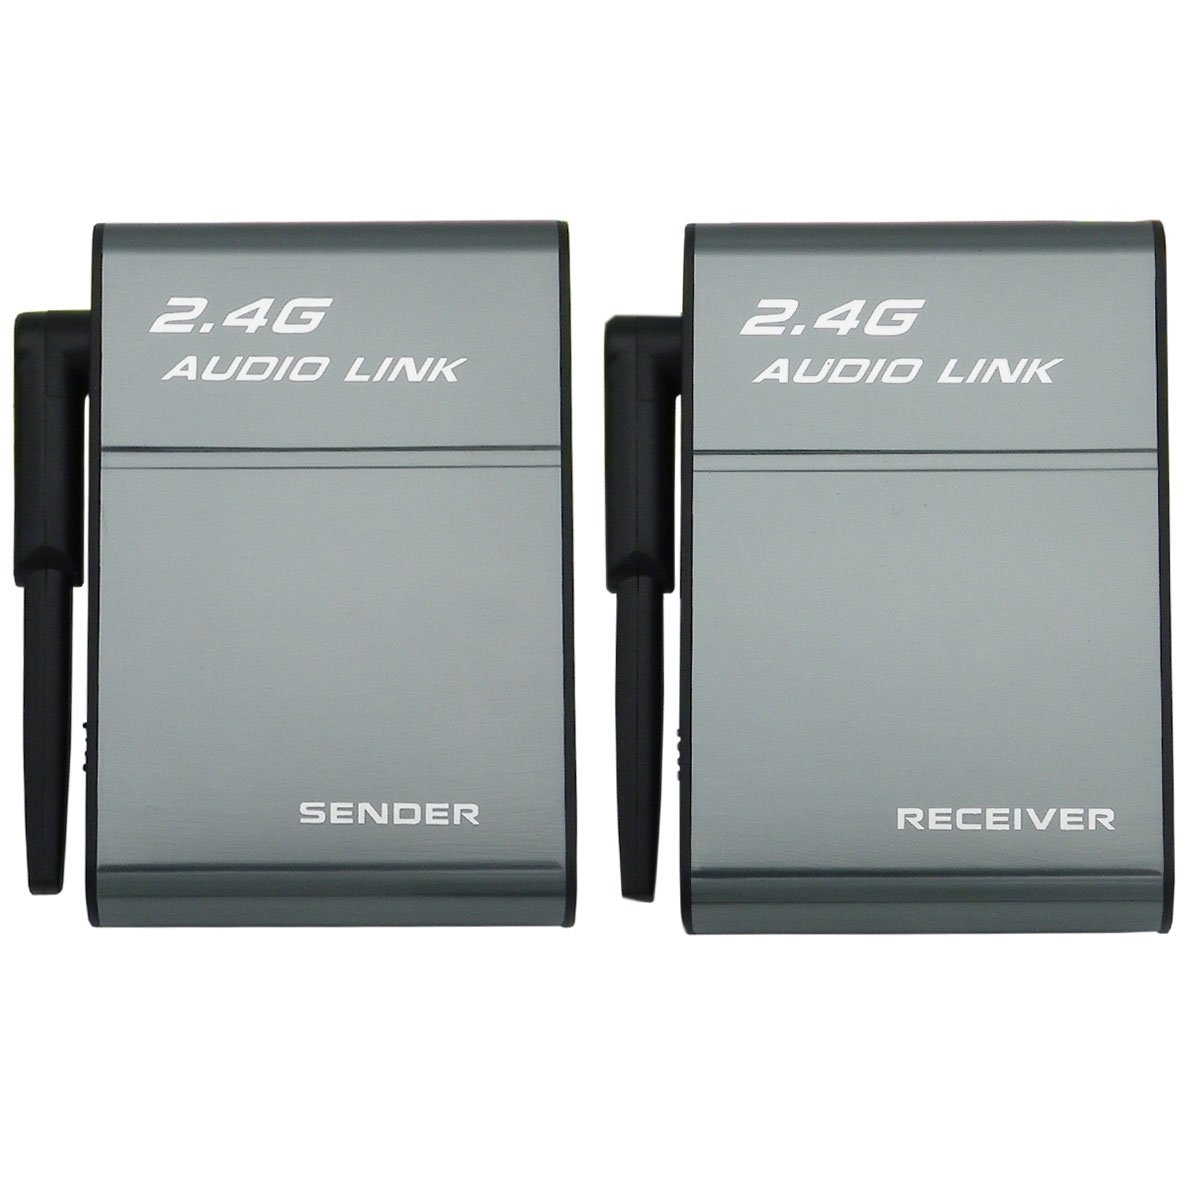 2.4G Digital Wireless Audio Transmitter Sender & Receiver Adapter for HiFi Home Theater System Speaker Amplifier by HopCentury